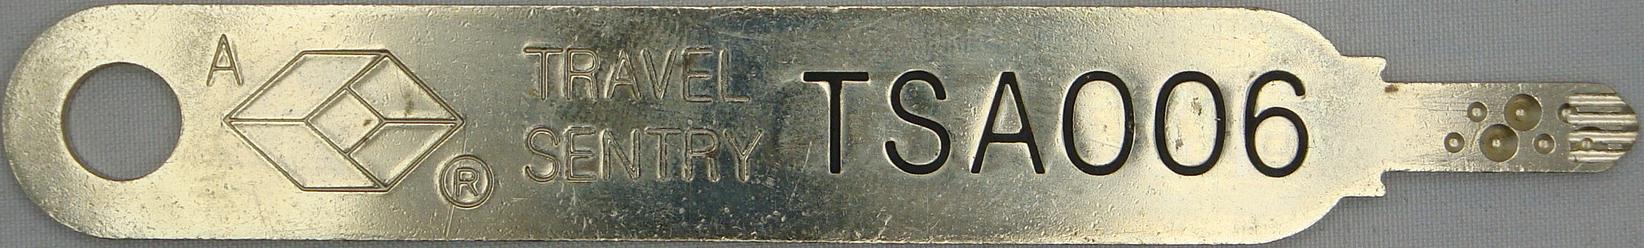 One of the seven Sentry locks.